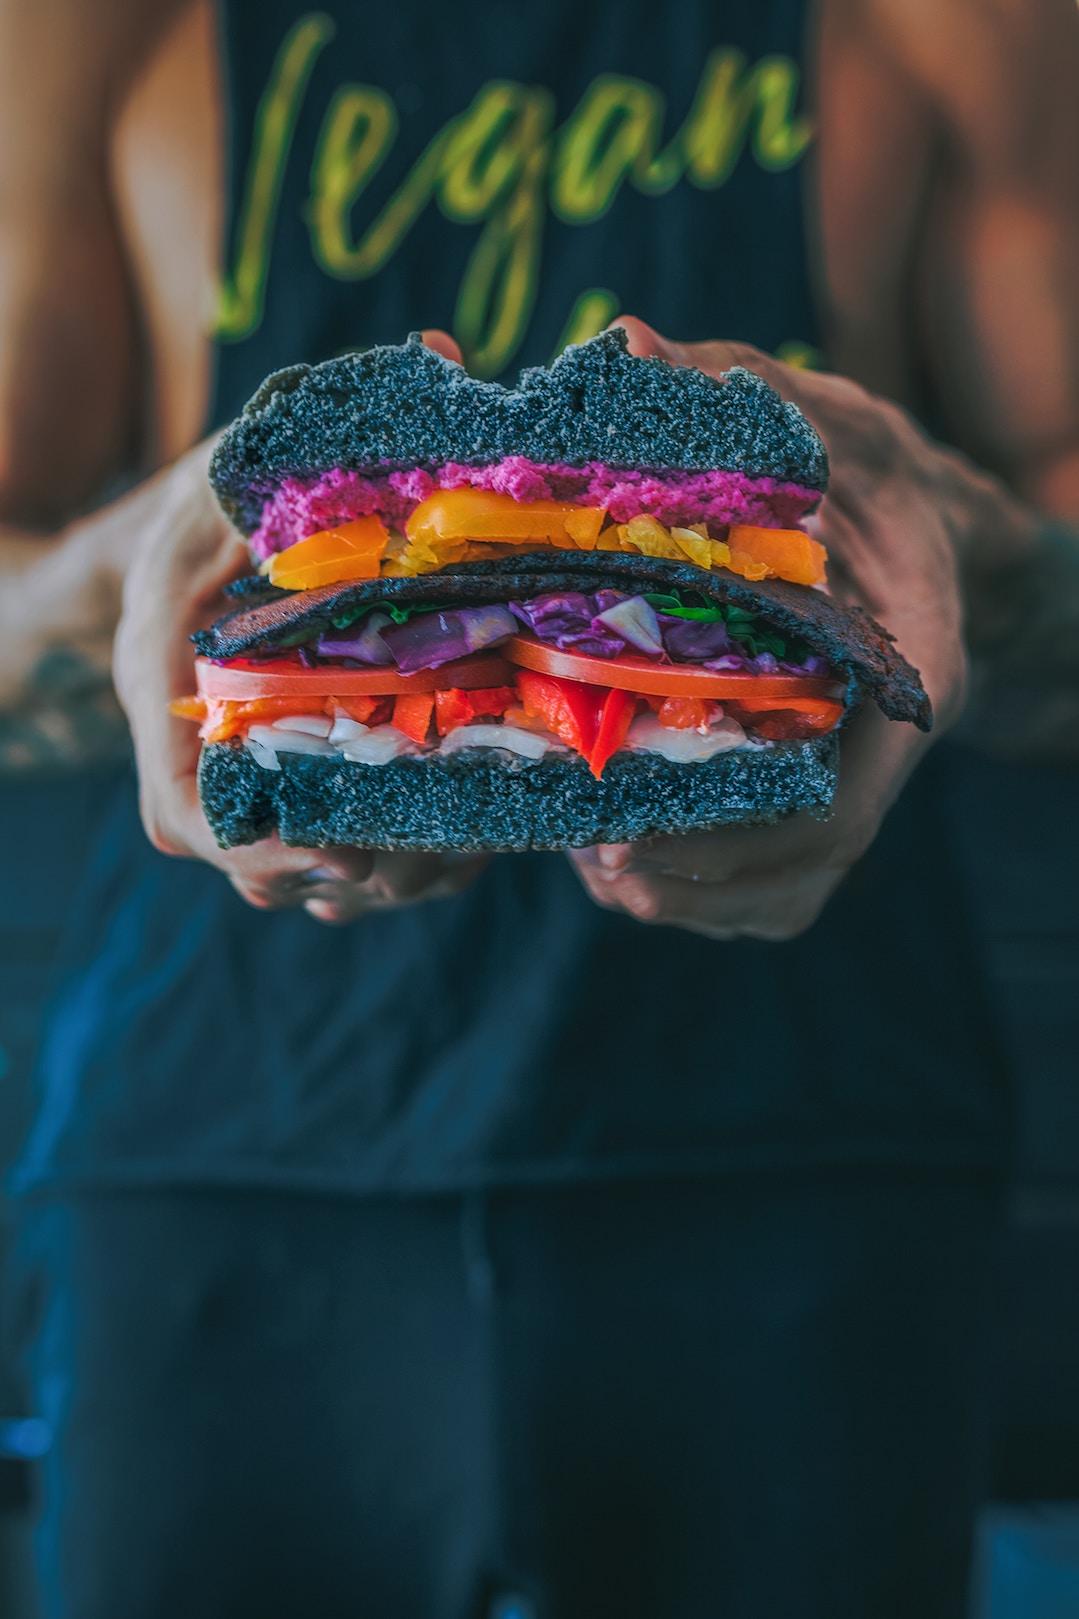 Food art, vegan-sandwich, creative cooking